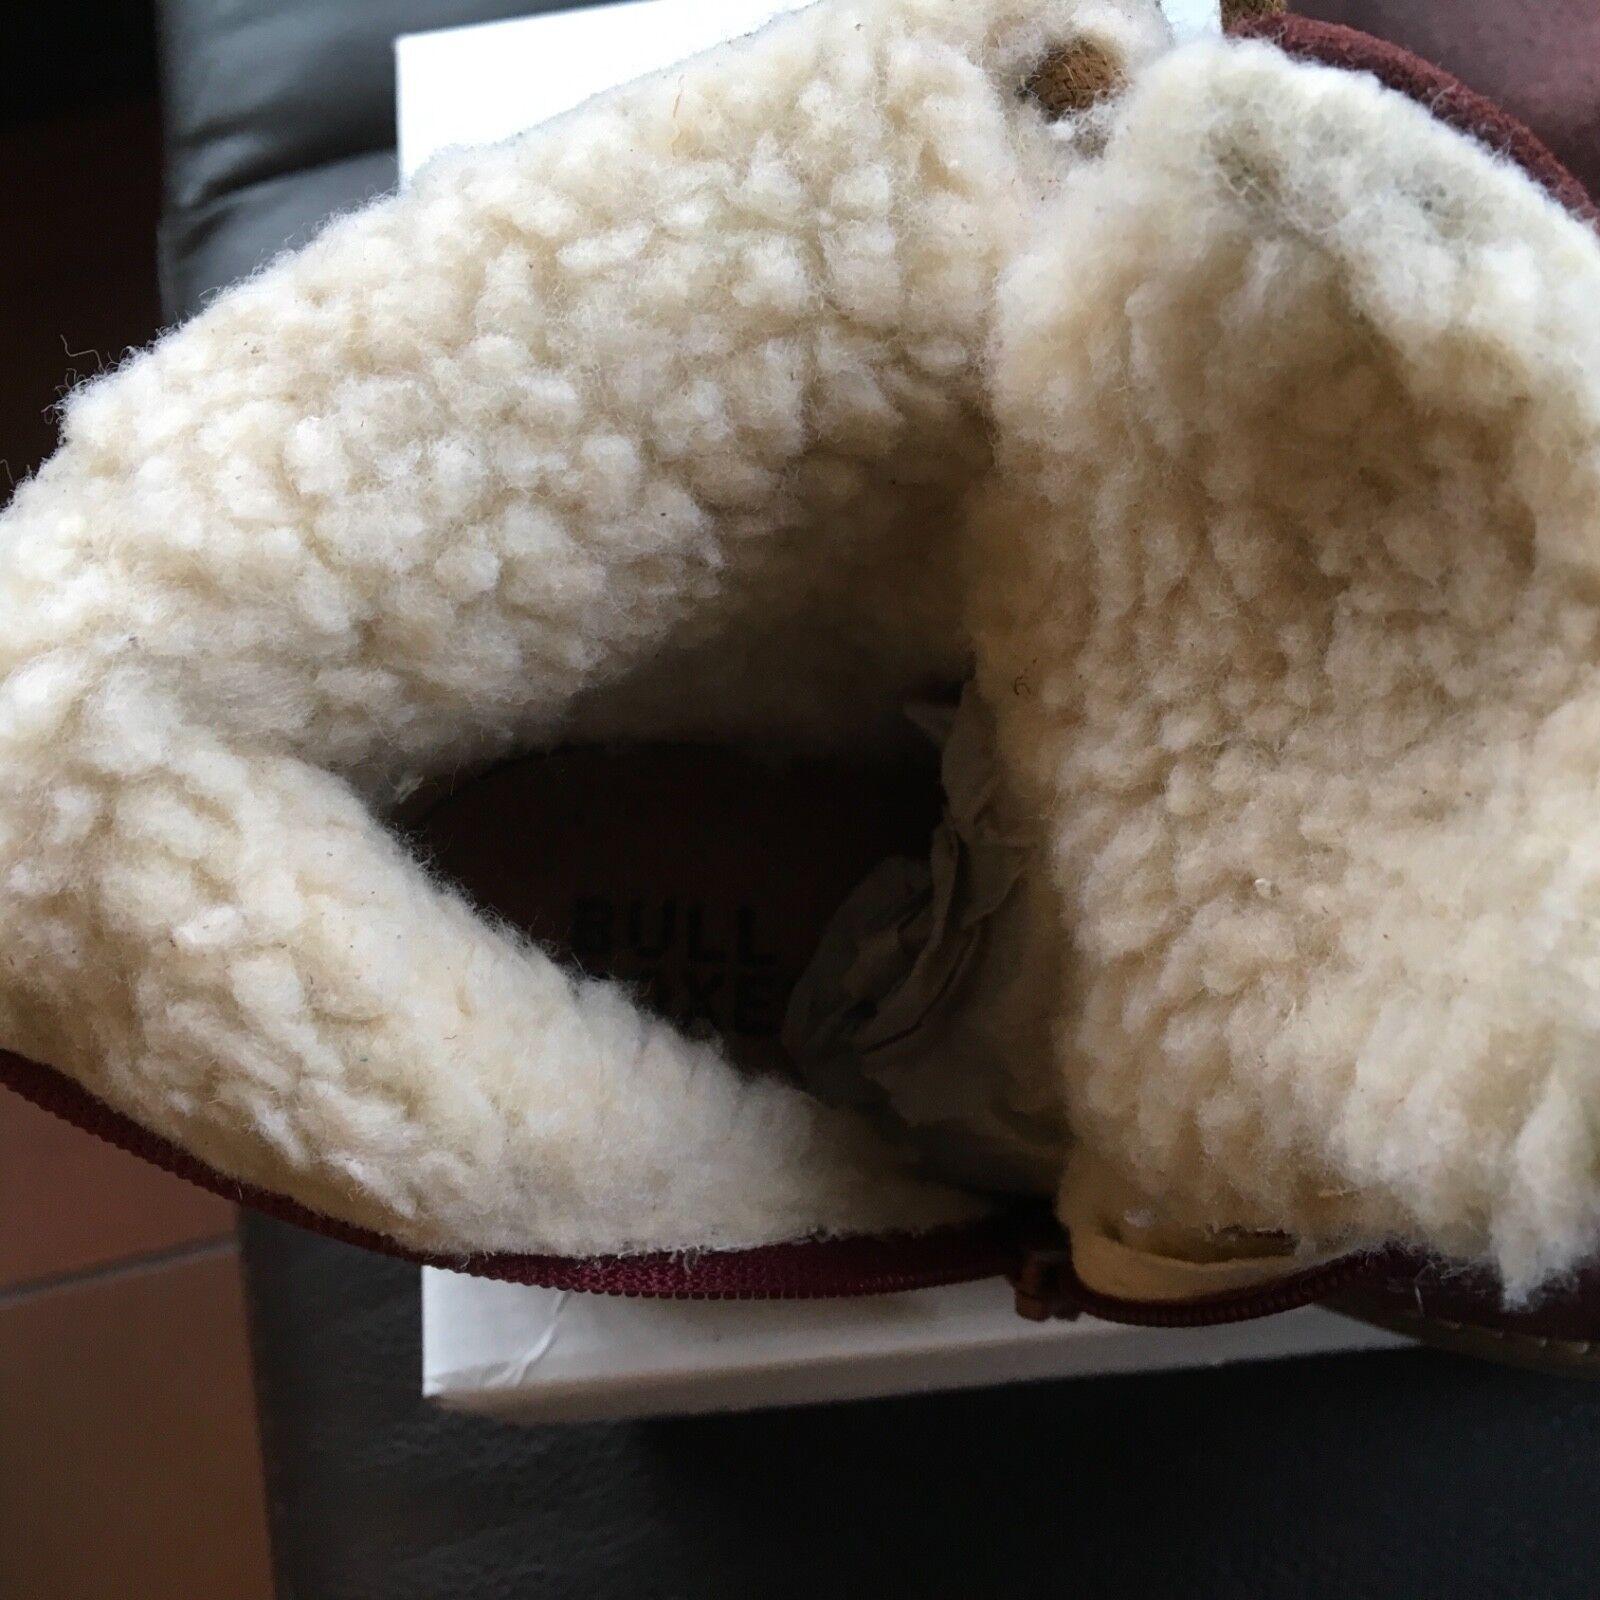 Bull Boxer Stiefel Gr.30, aus Leder Kinder, Bordeaux, Gr.30, Stiefel Neu mit Karton bbd731